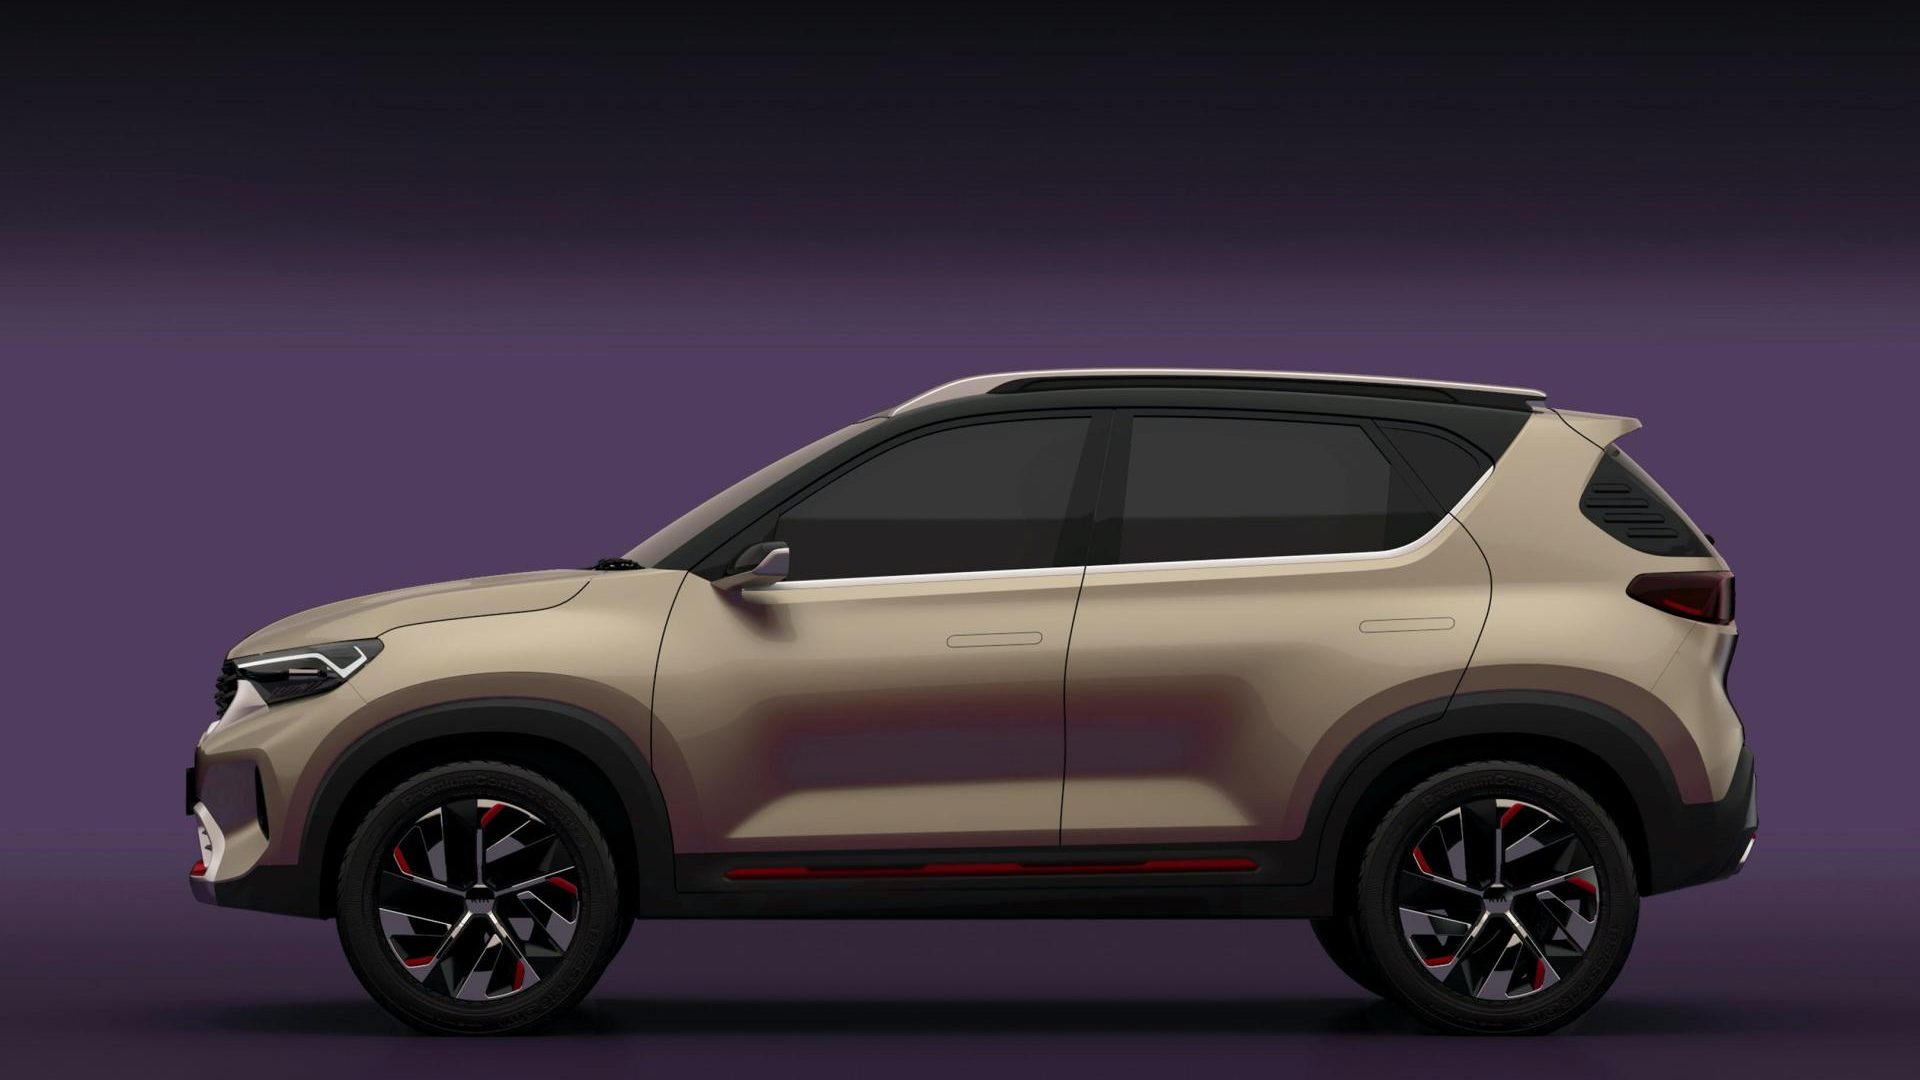 2020-Kia-Sonet-Concept-03